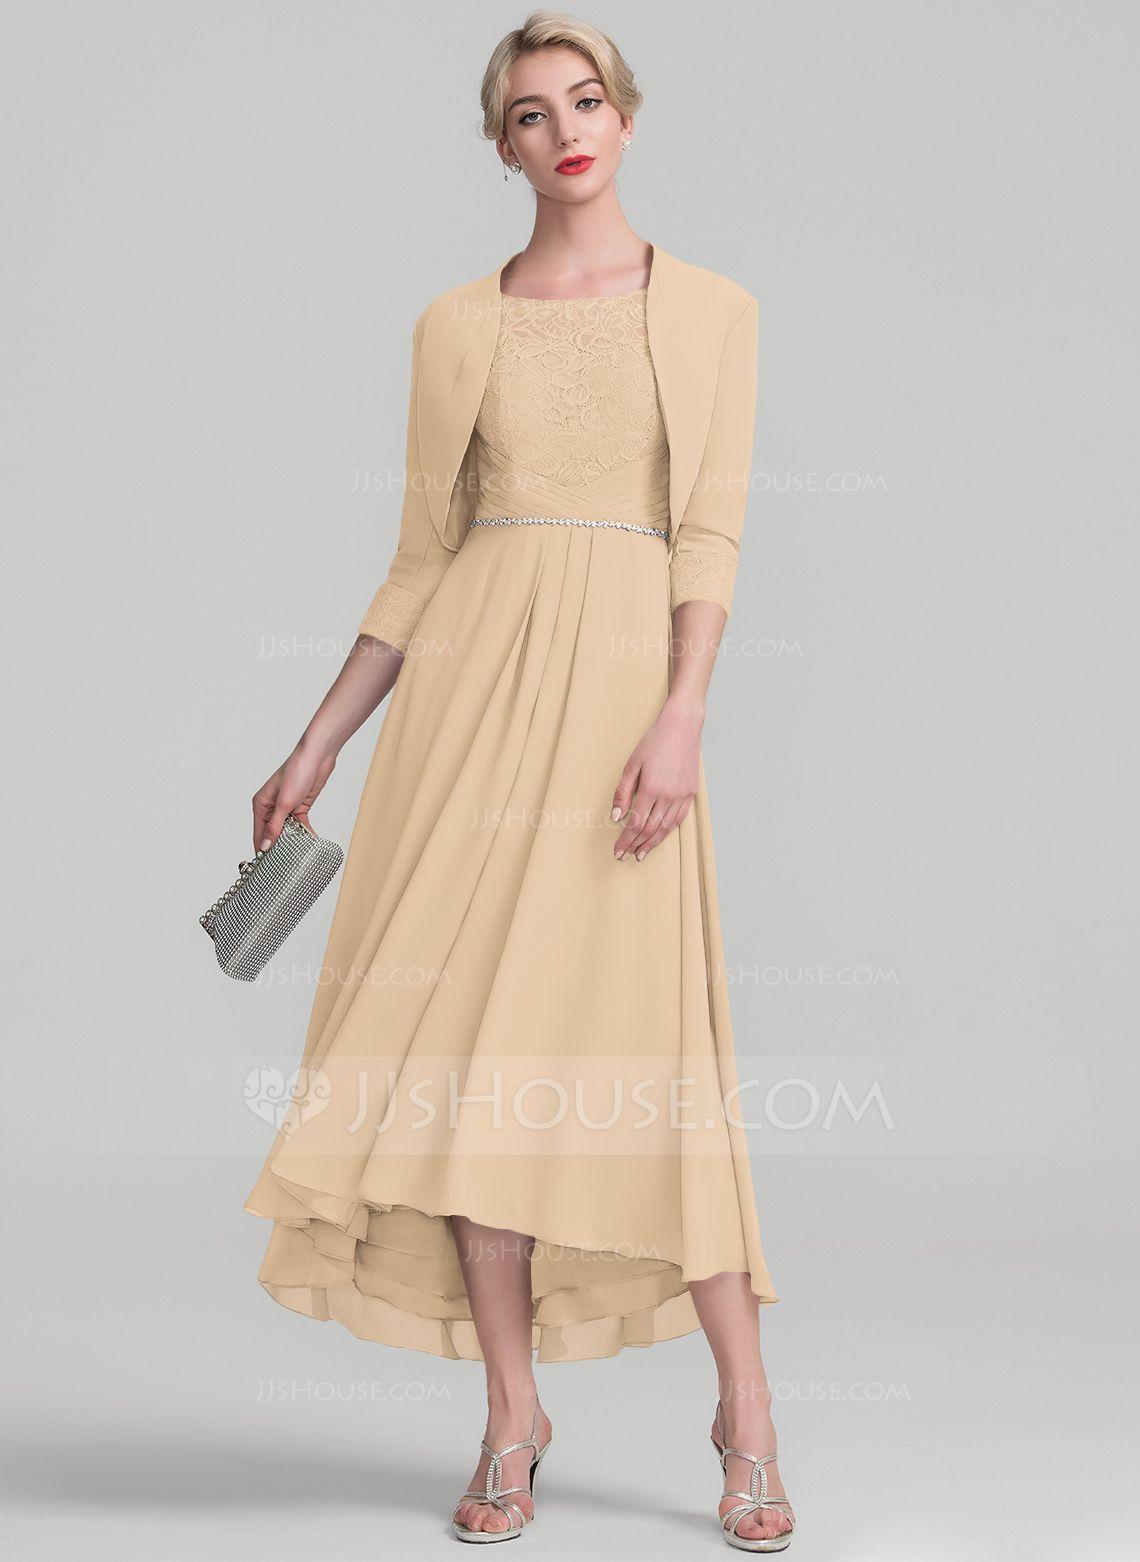 e8fa75e4d69 A-Line Princess Scoop Neck Asymmetrical Chiffon Lace Mother of the Bride  Dress With Beading (008118940) - Mother of the Bride Dresses - JJ s House